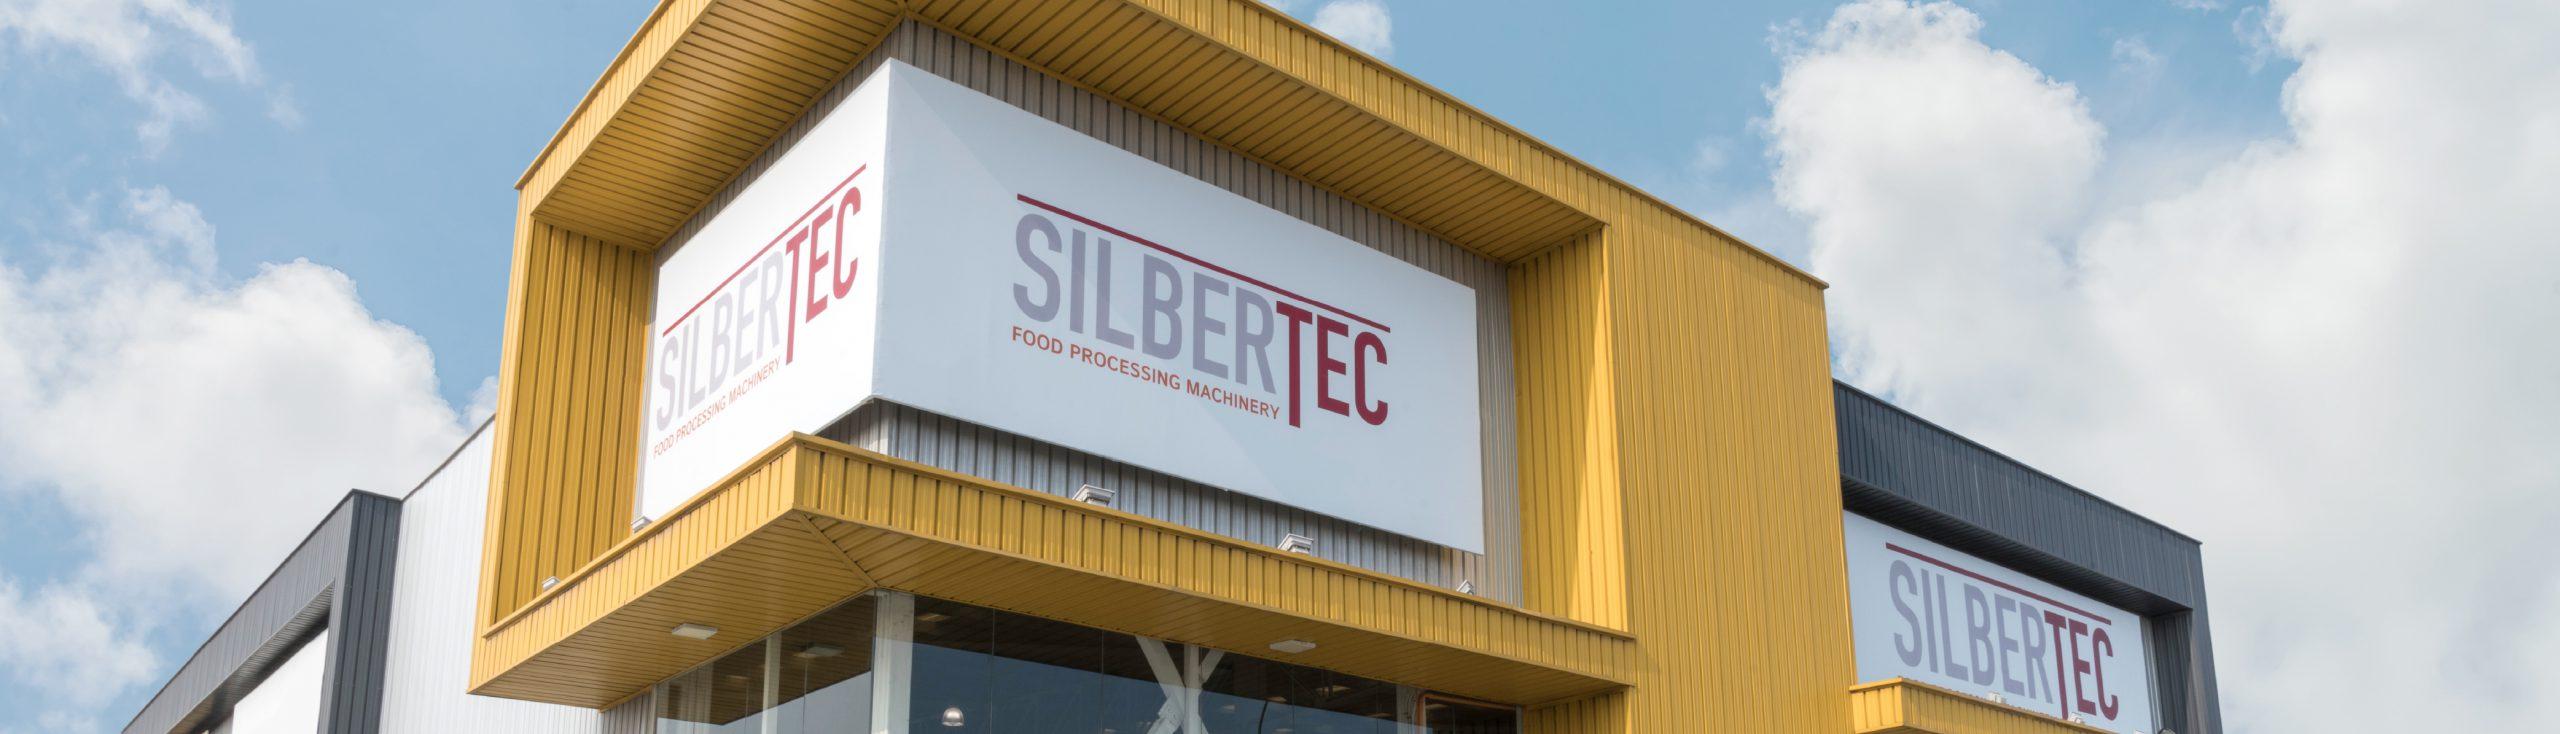 Silbertec